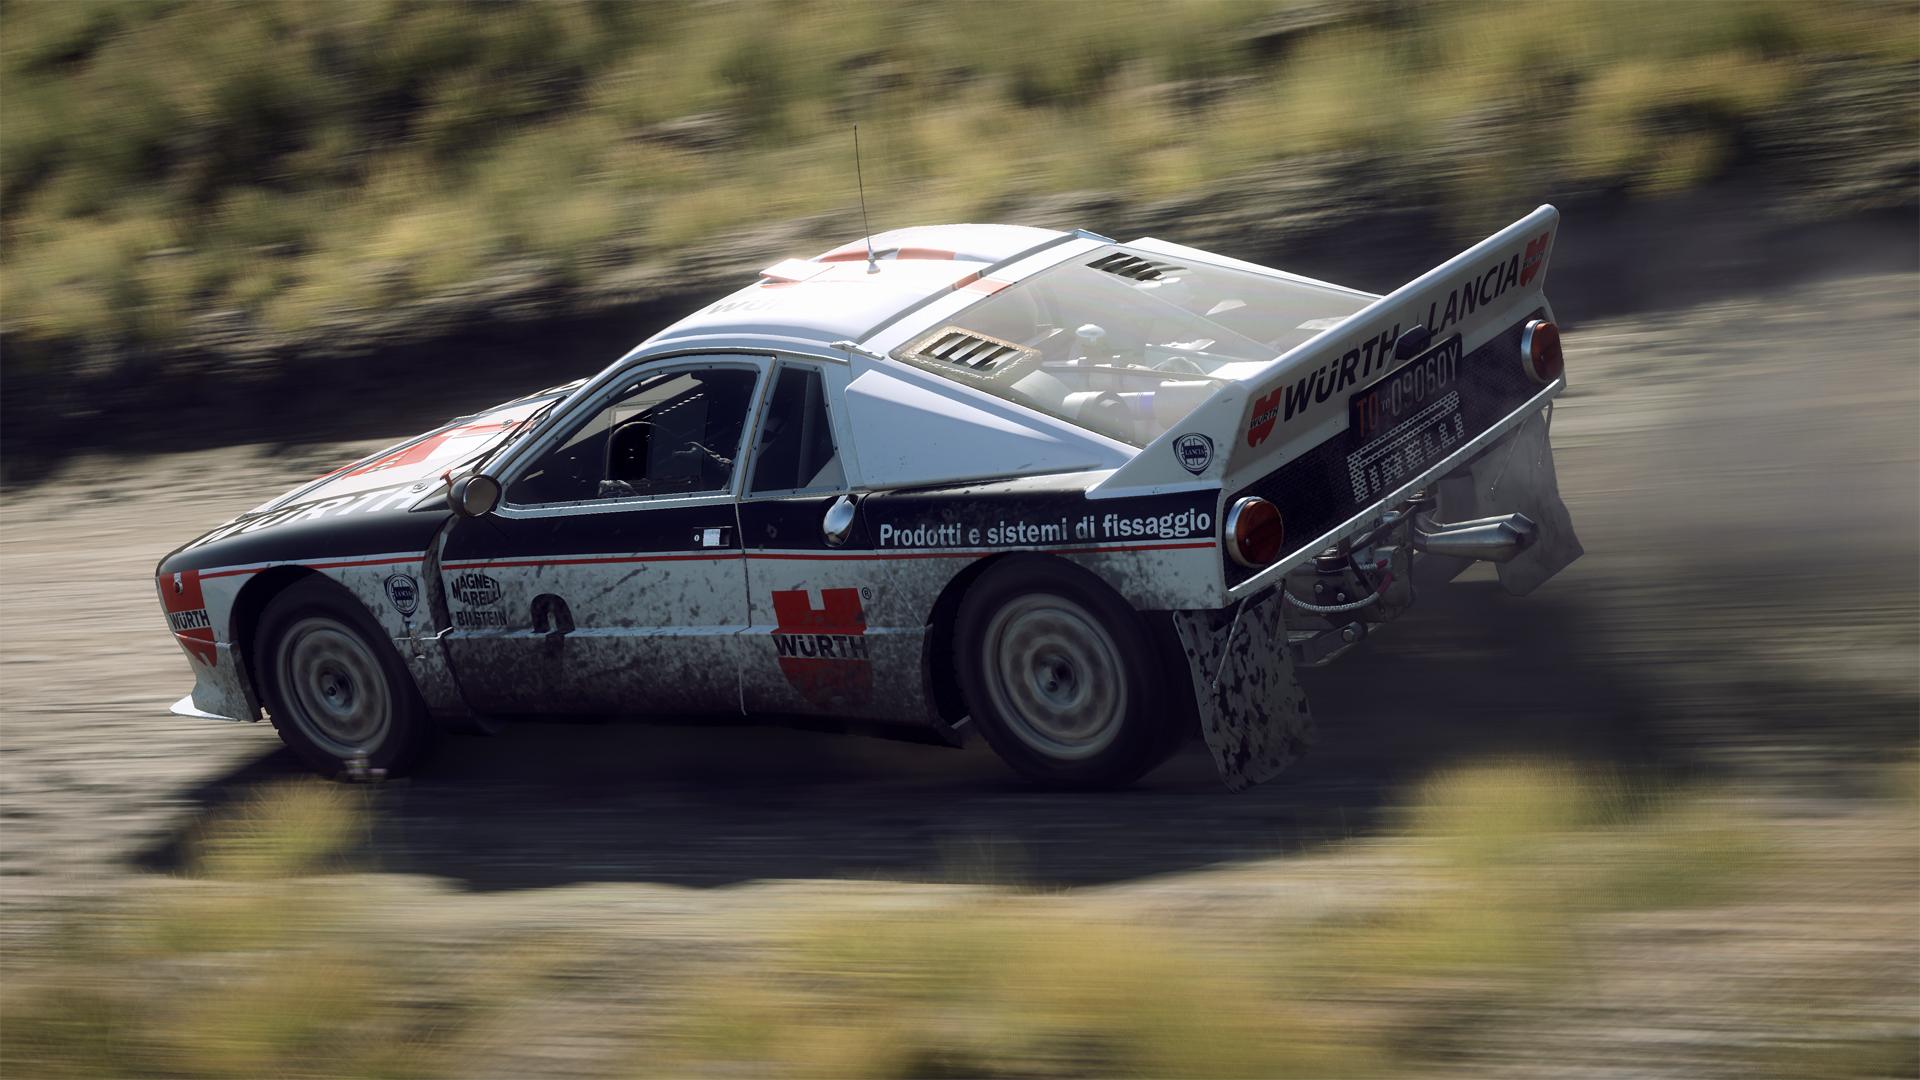 Lancia_Wales_1.jpg